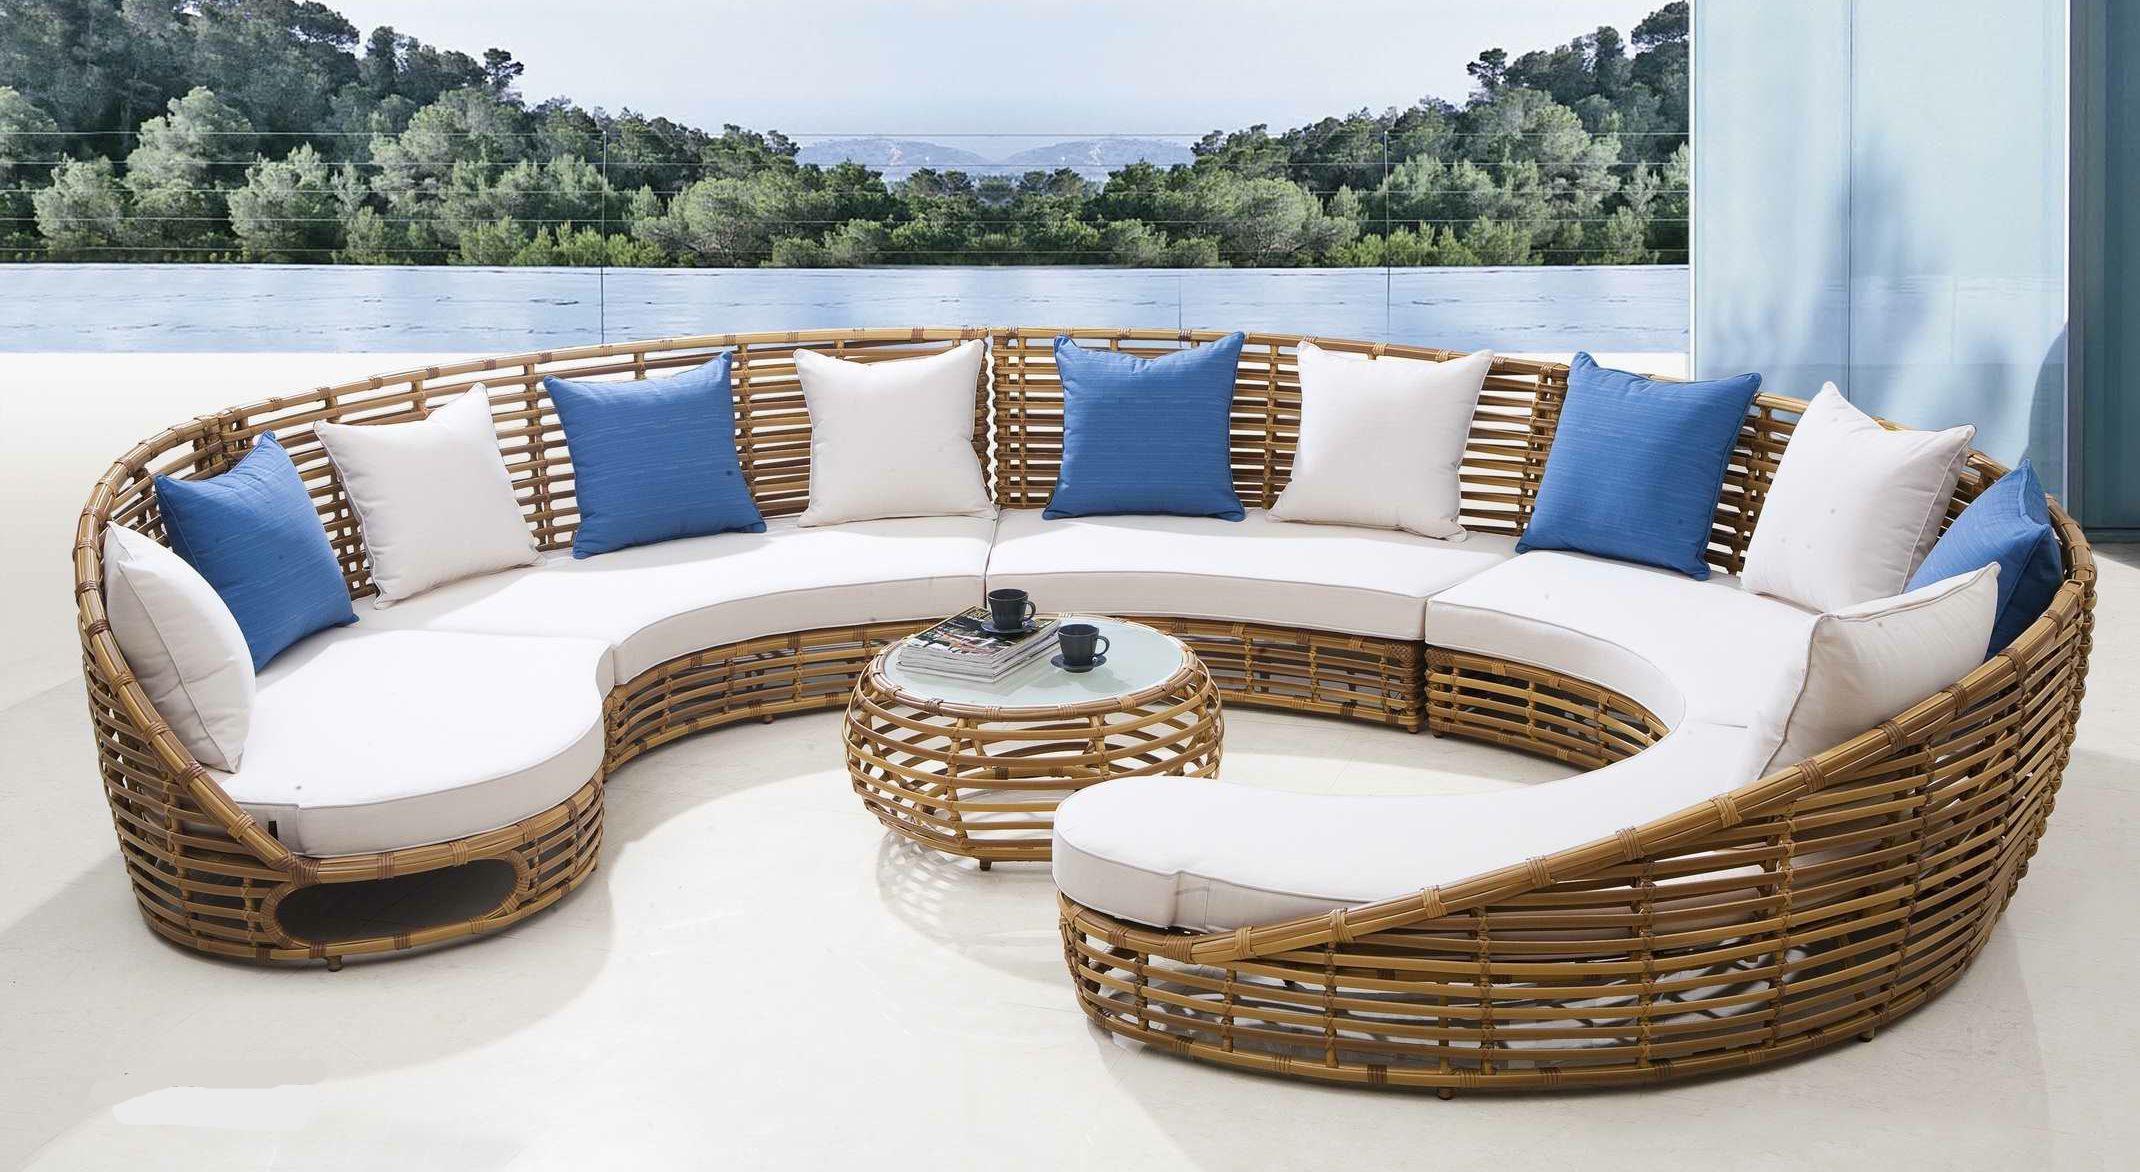 Super Chewy Patio Furniture Cushions Thick | Outdoor Wicker ... intérieur Salon De Jardin Artelia